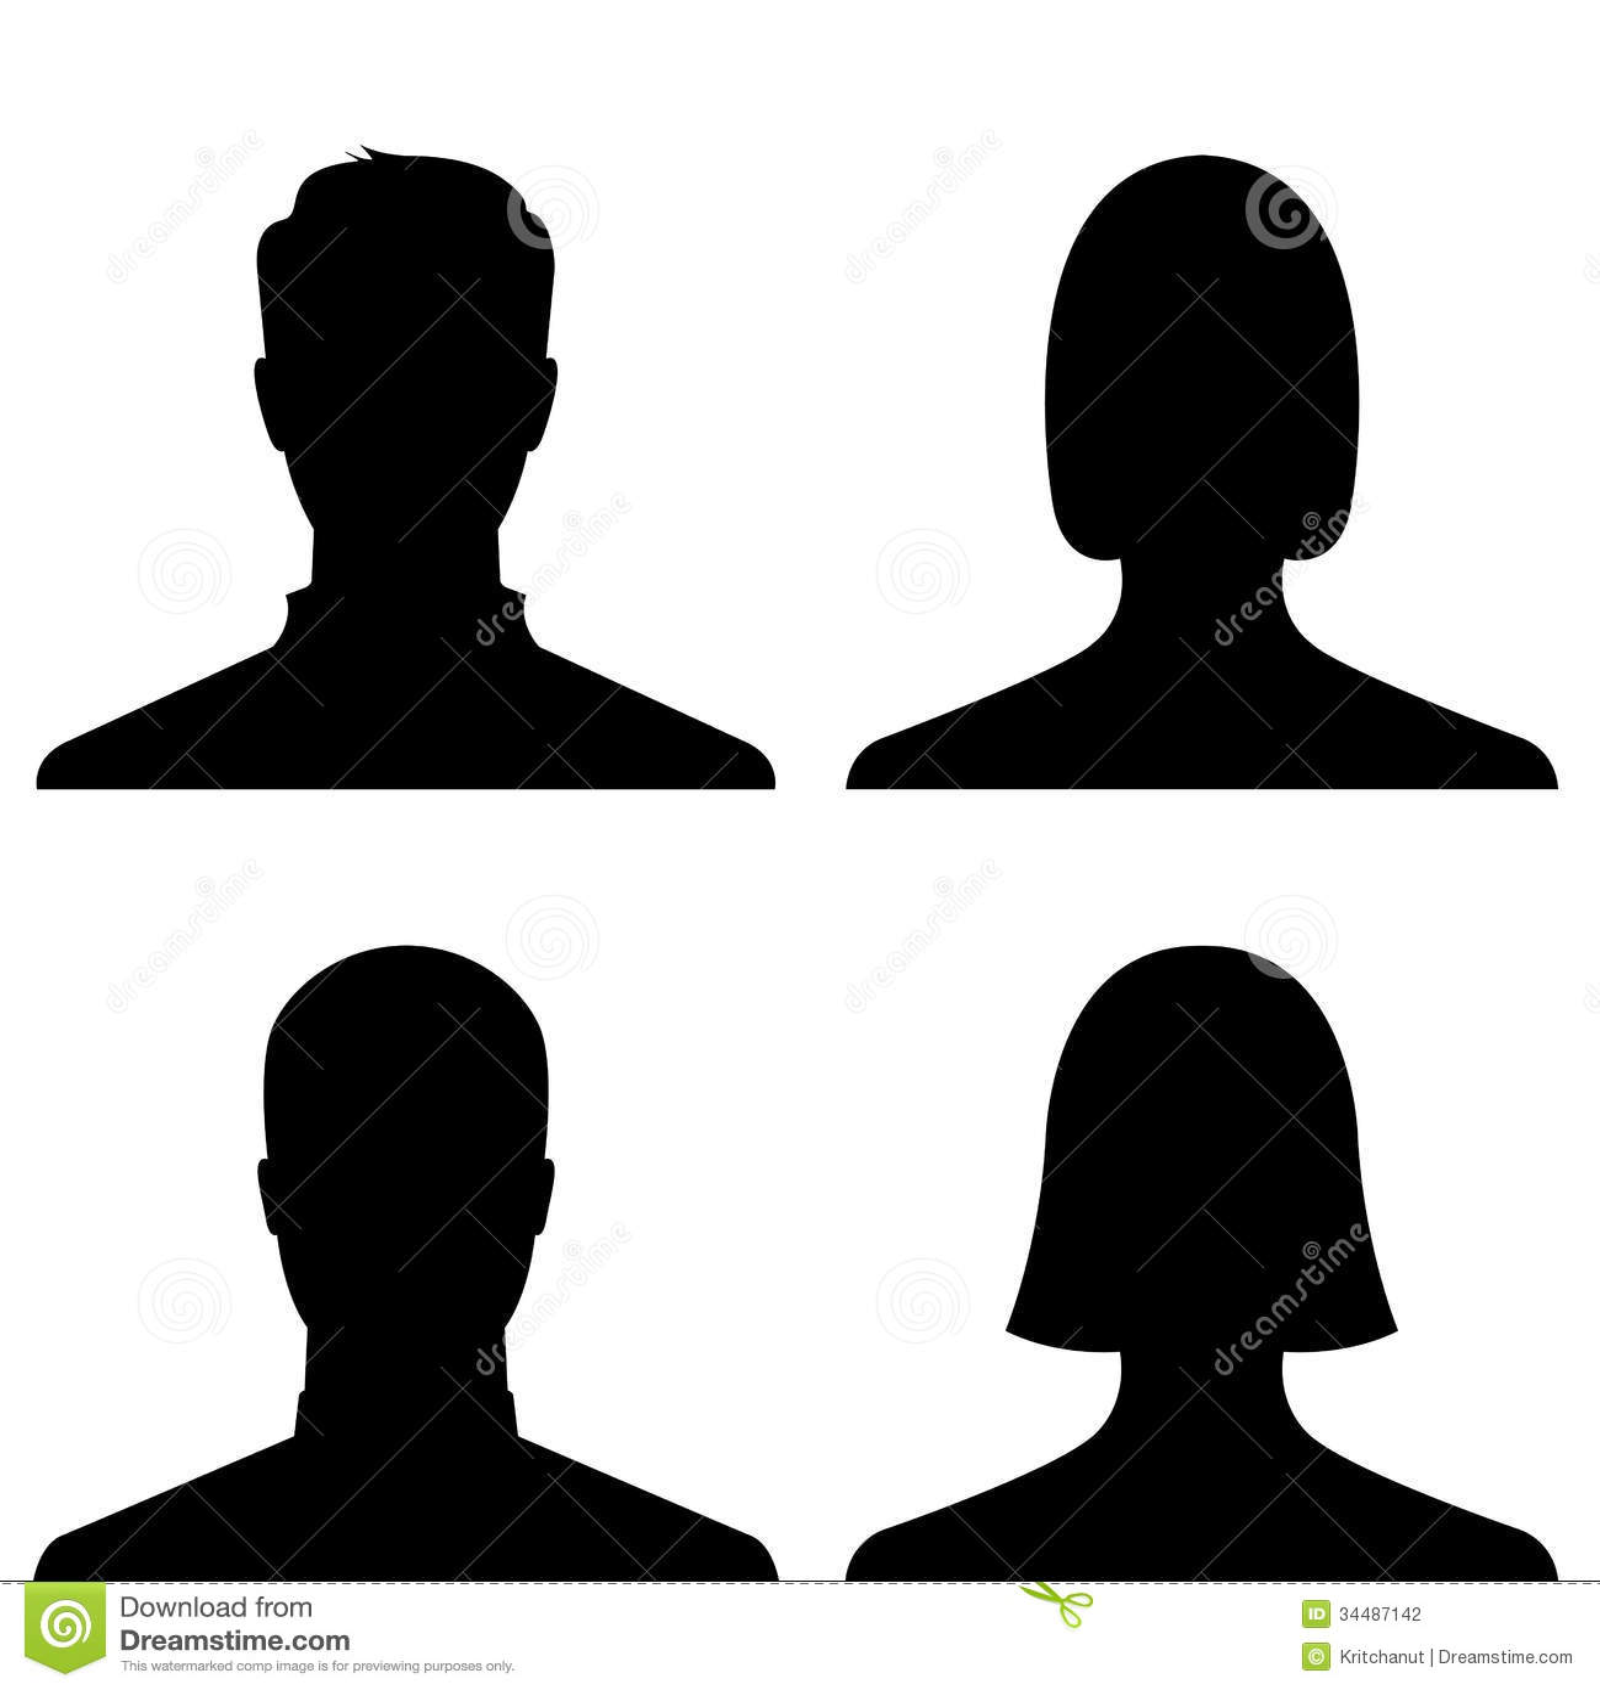 A profile for a women seeking a man